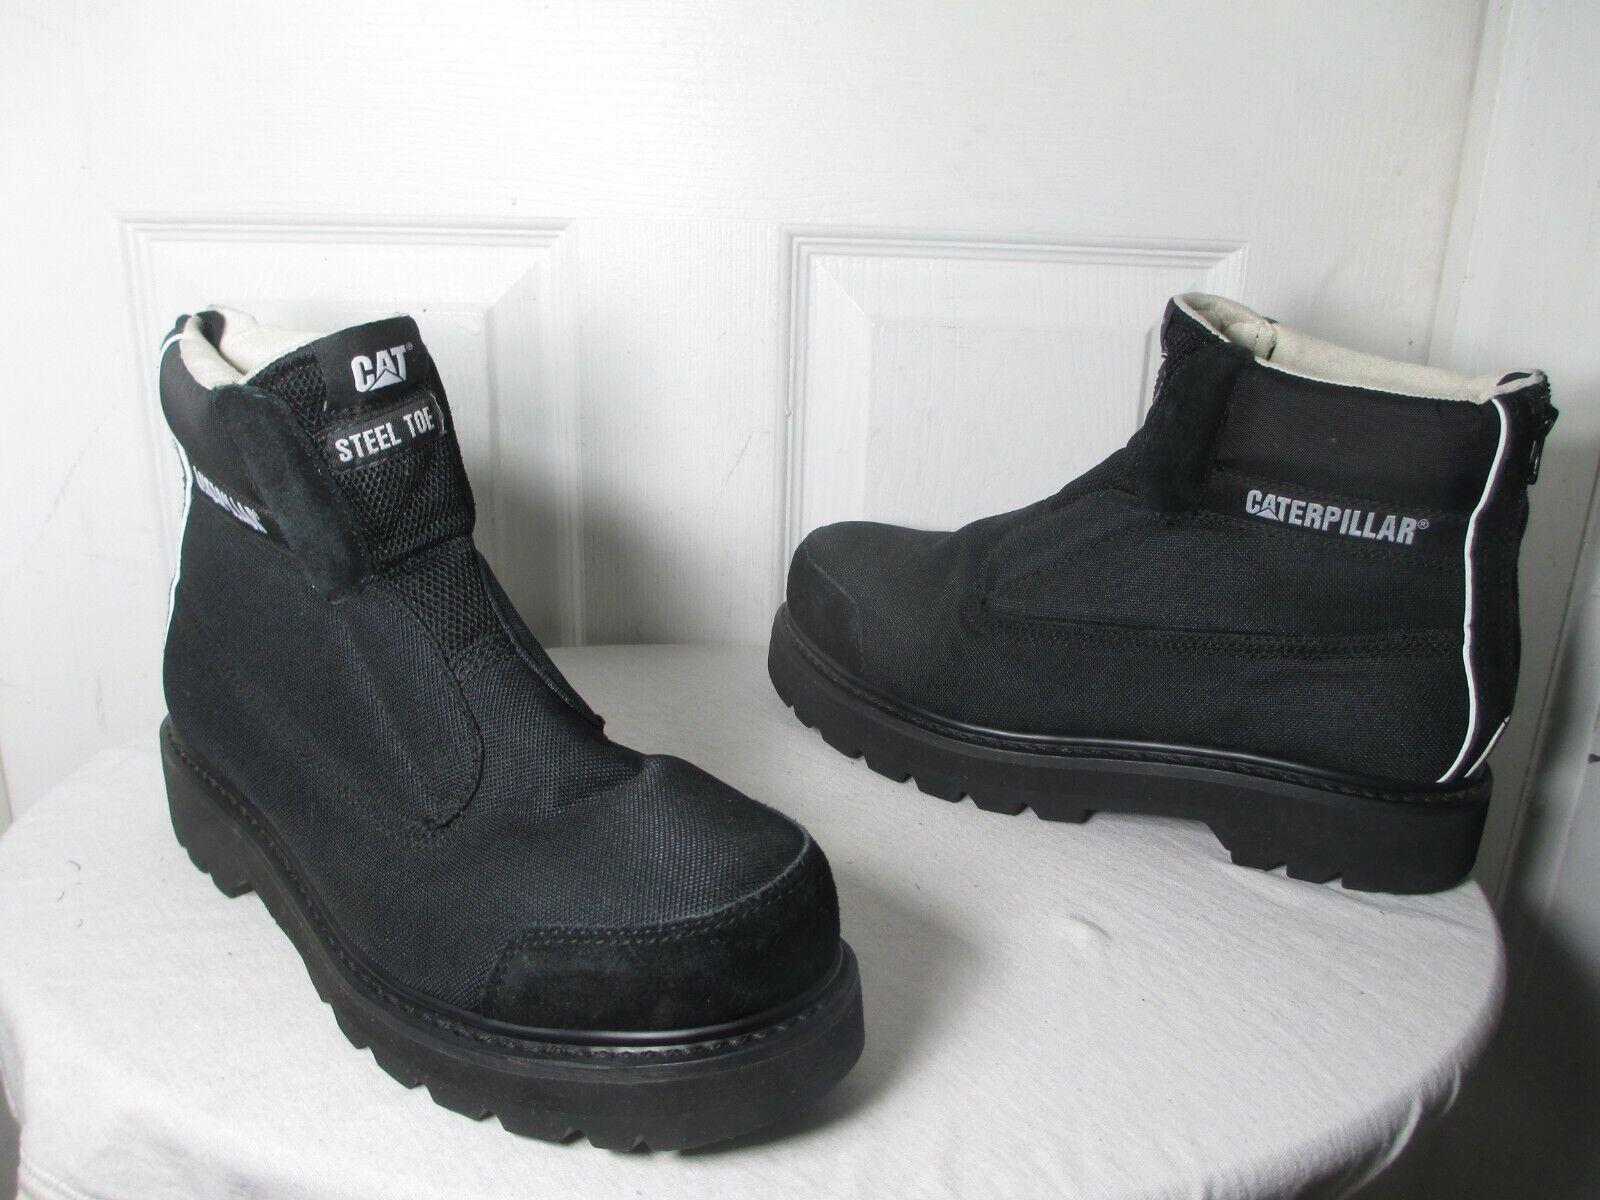 CHRISTOPHER SHANNON X CAT FW15 Moda Calzado botas para Hombre Puntera De Acero EE. UU. 12 Reino Unido 11